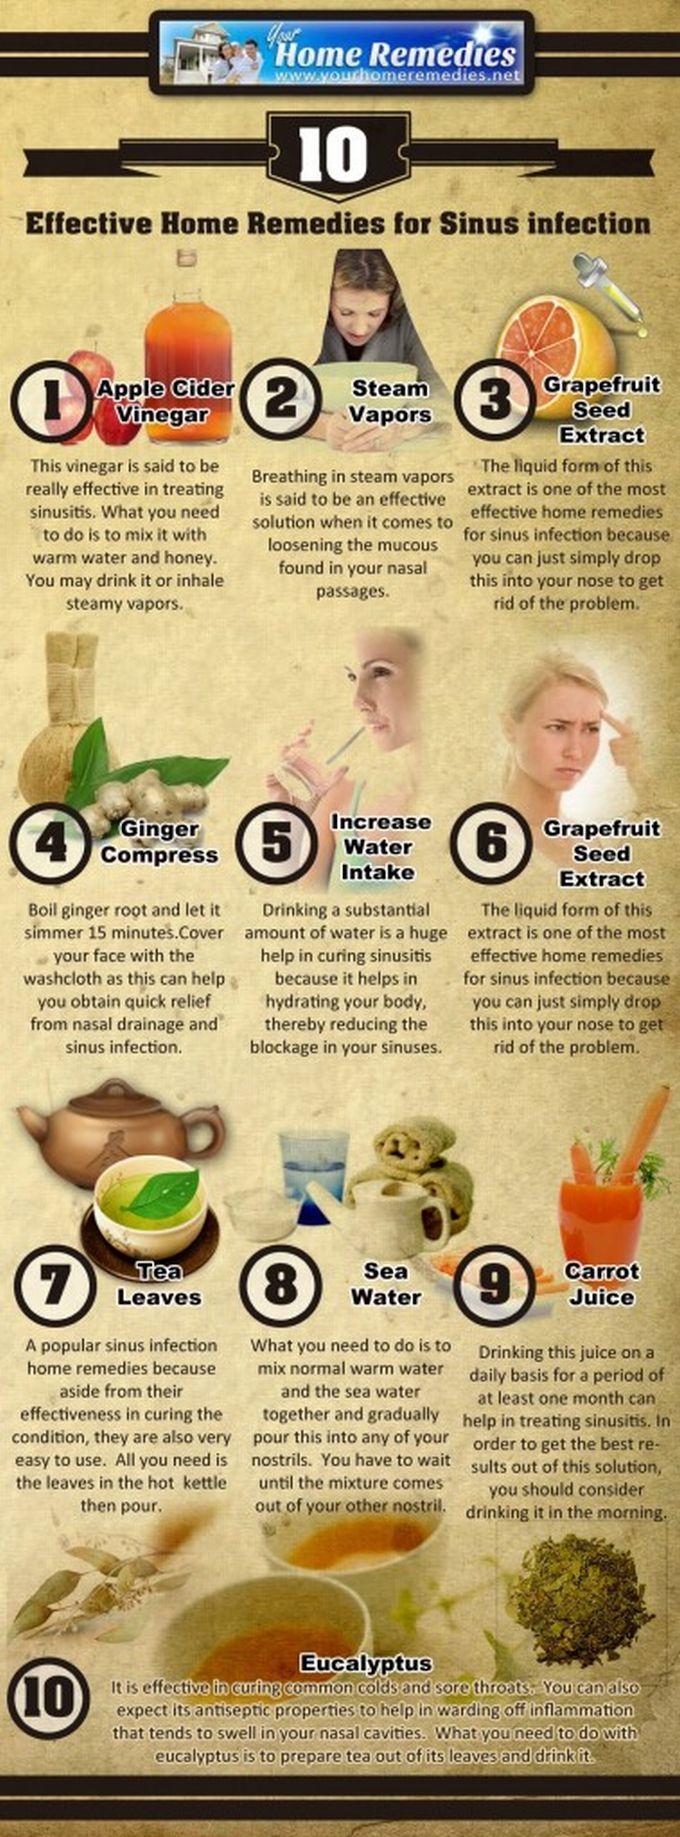 how to make a doctor prescribe you prozac